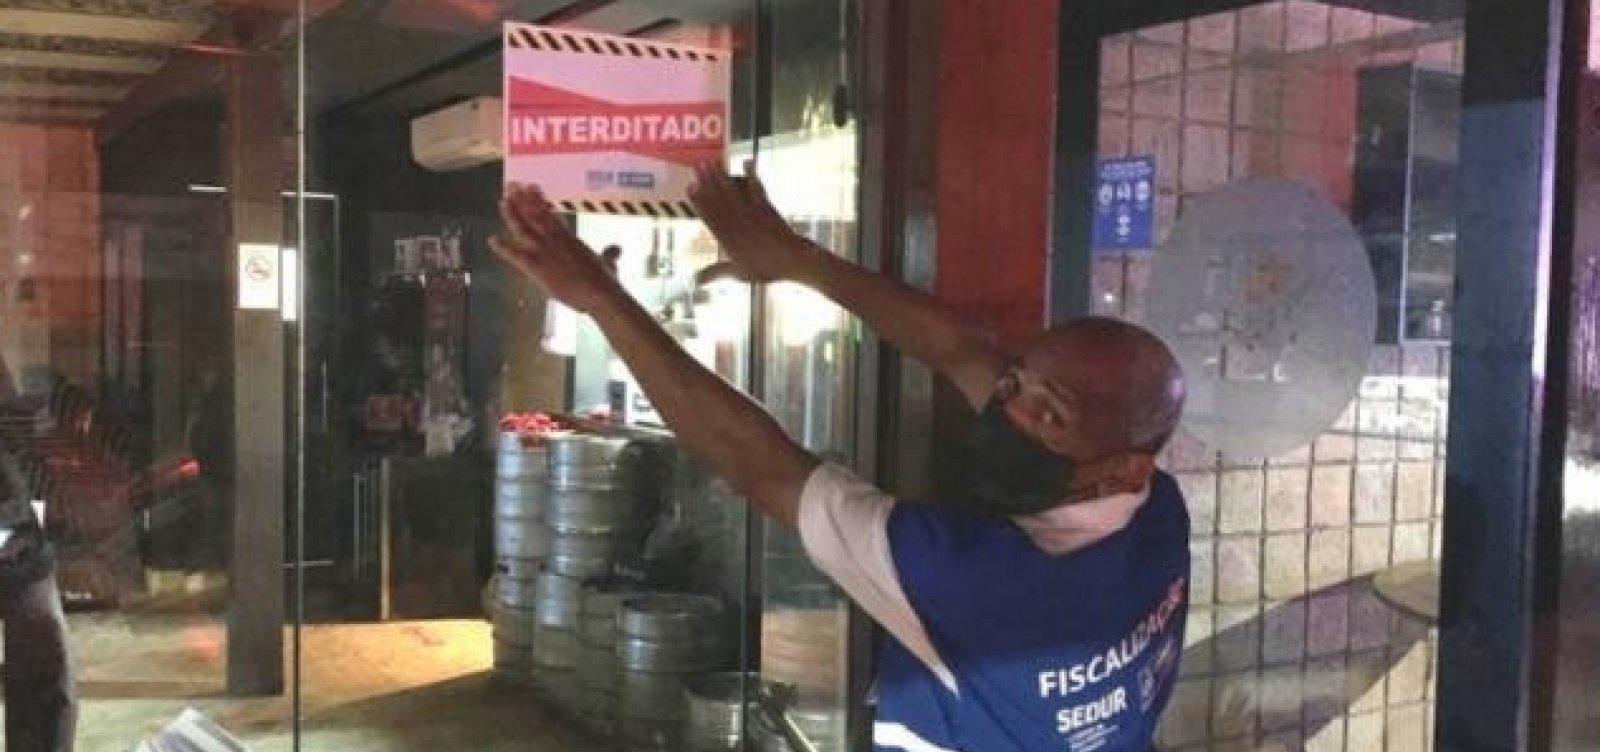 Covid-19: Sedur interdita 12 estabelecimentos no final de semana